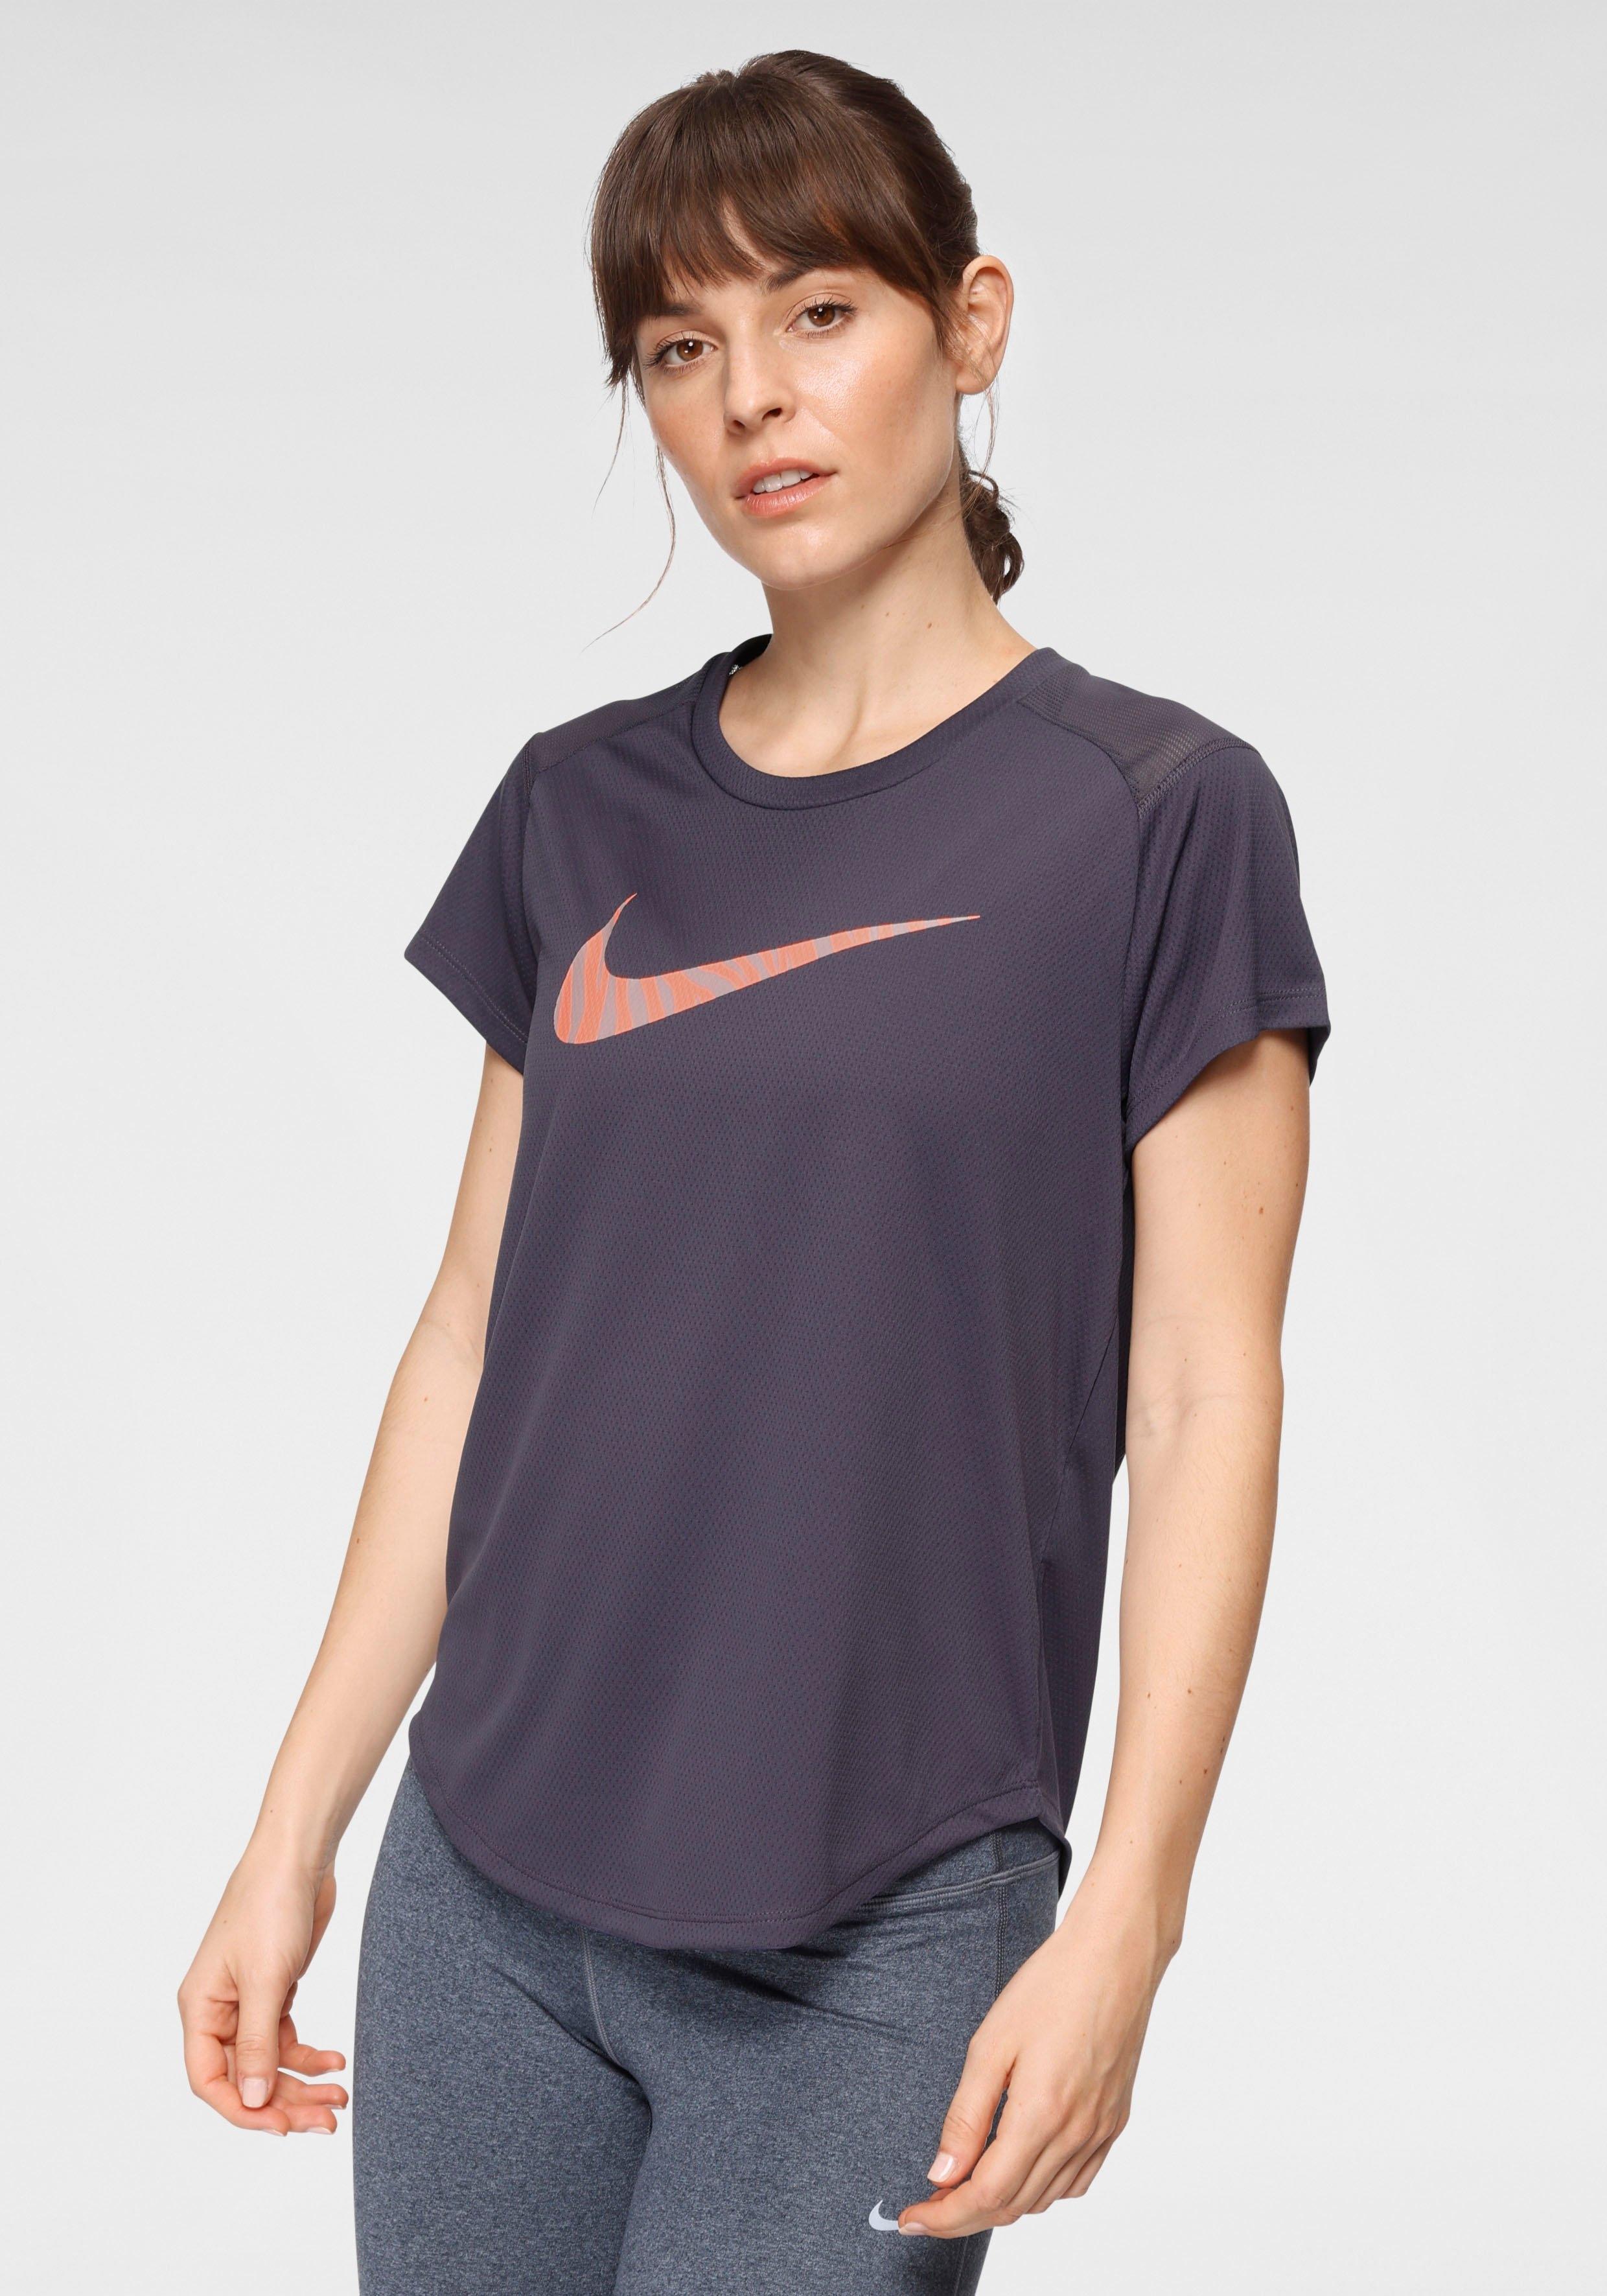 Nike runningshirt »Nike Run Icon Clash (2) Women's Short-sleeve Running Top« bij OTTO online kopen